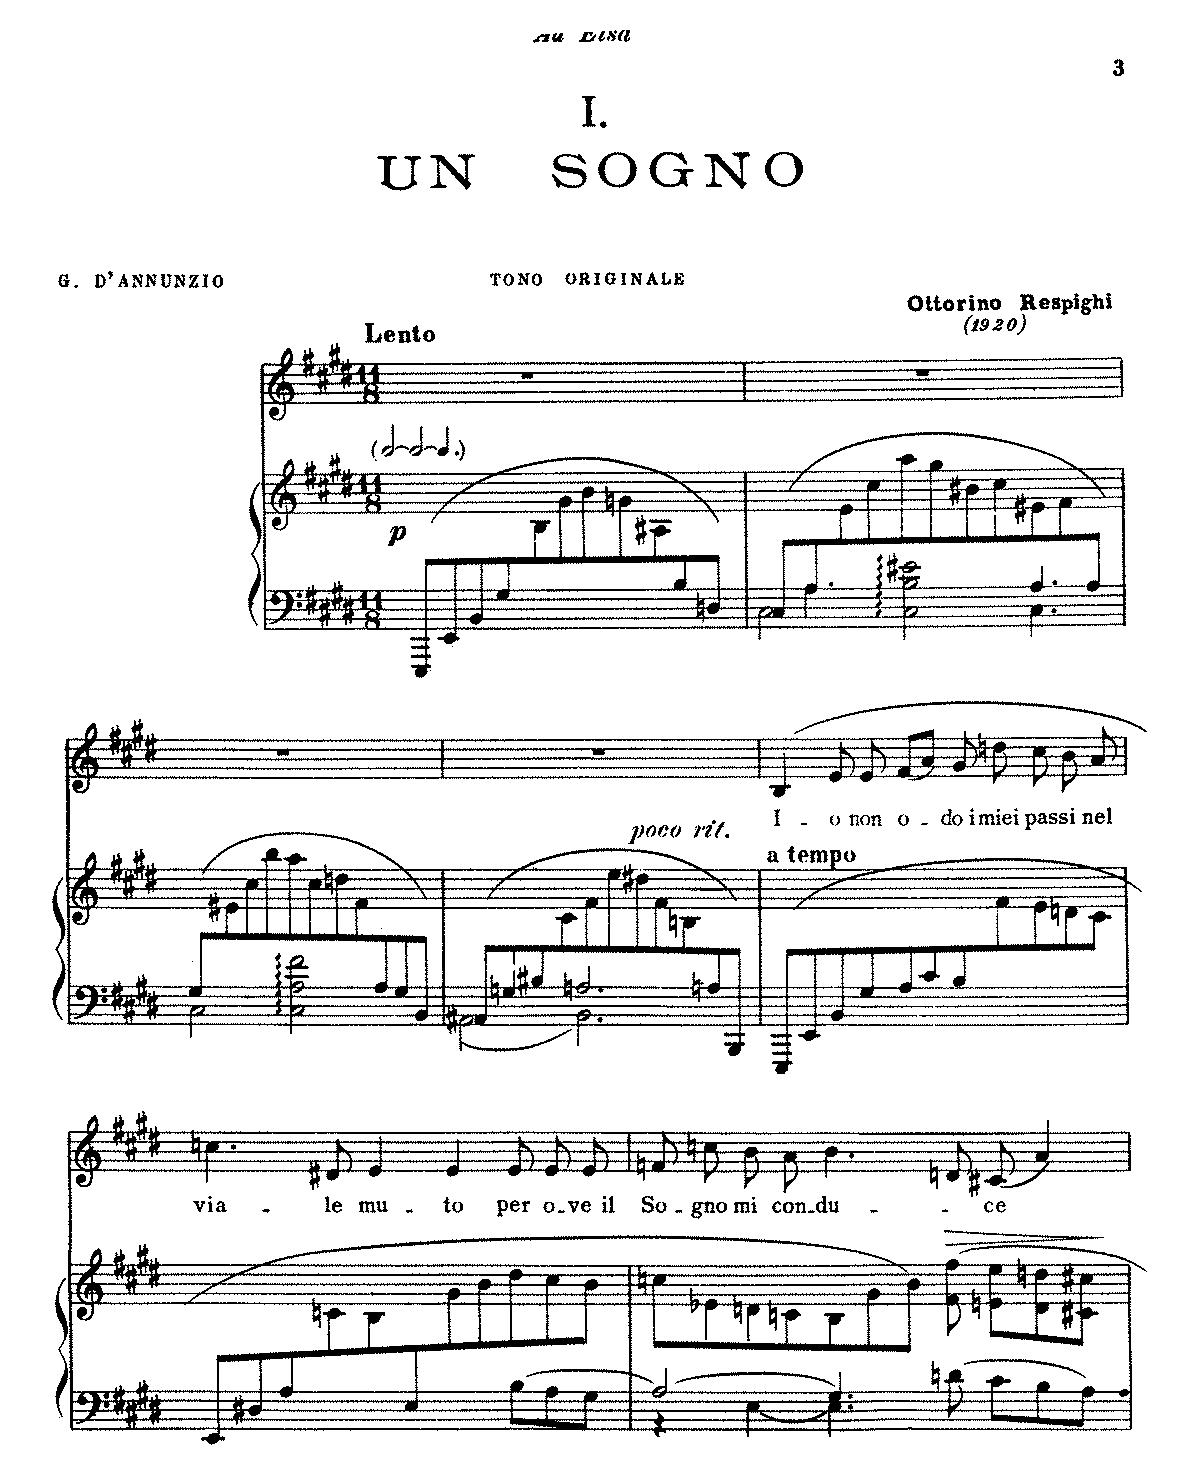 Free Sheet Music Public Domain: 4 Liriche (Respighi, Ottorino)